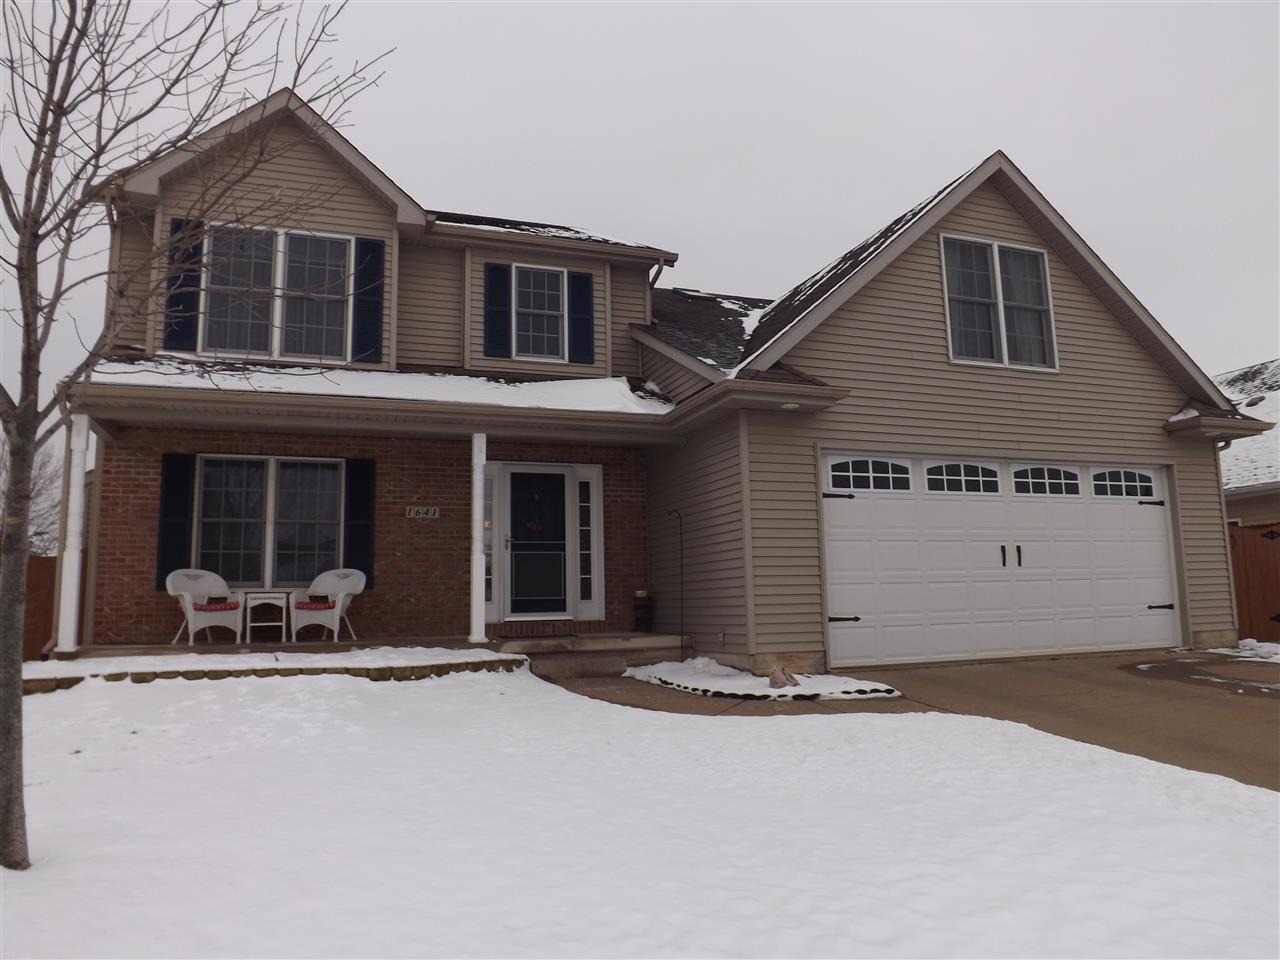 Real Estate for Sale, ListingId: 31442731, Davenport,IA52806